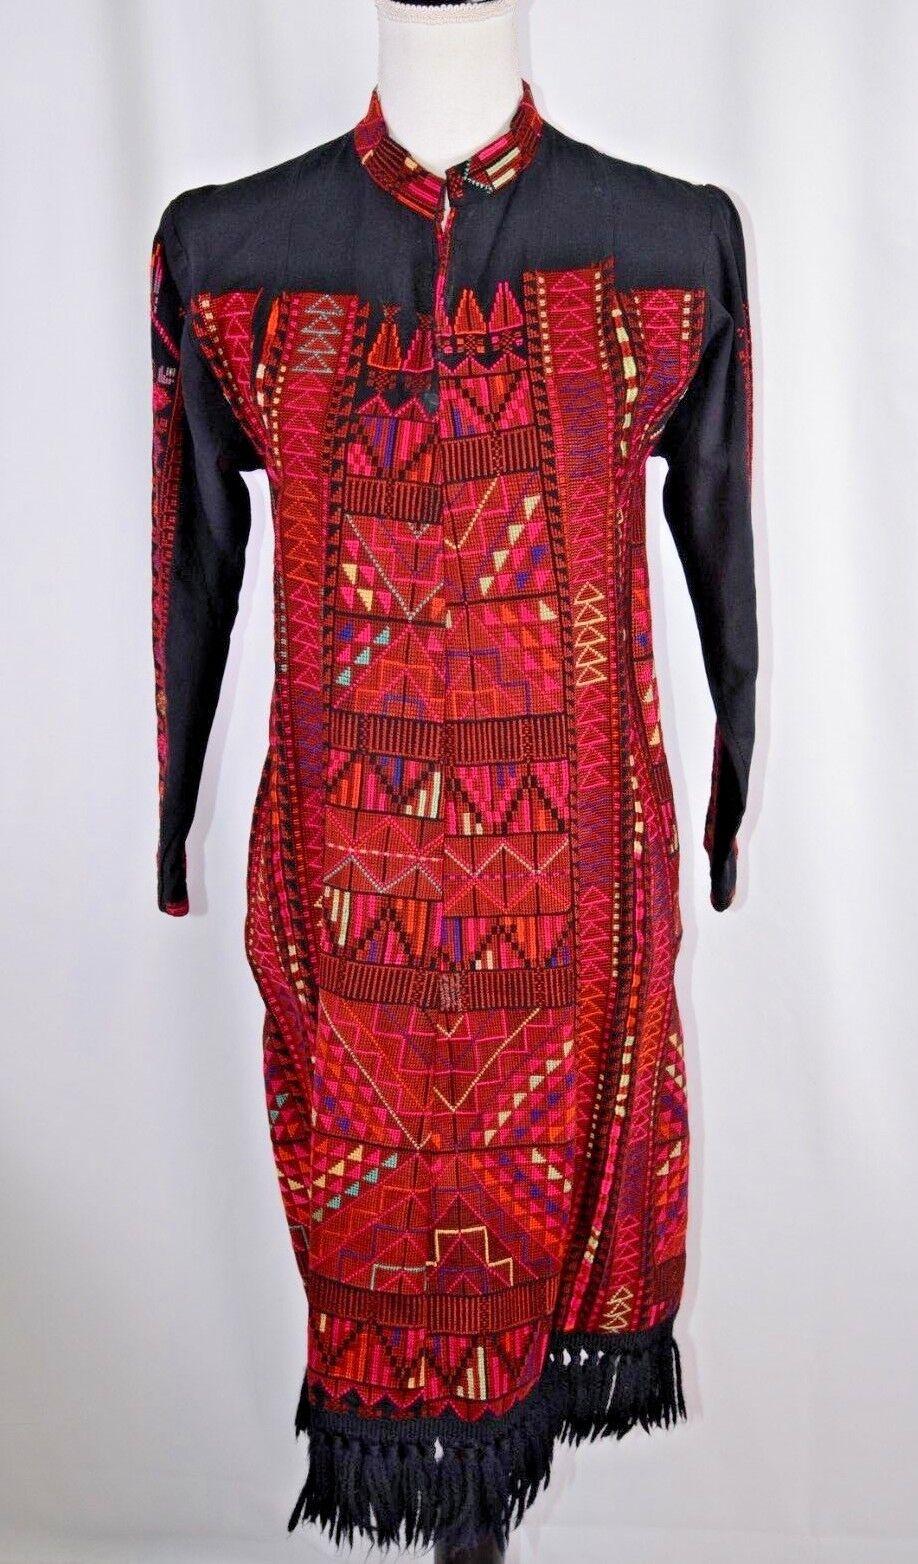 Unbranded Woherren Dashiki Dress Hand Made Größe Small Farbeful Embroiderot Boho